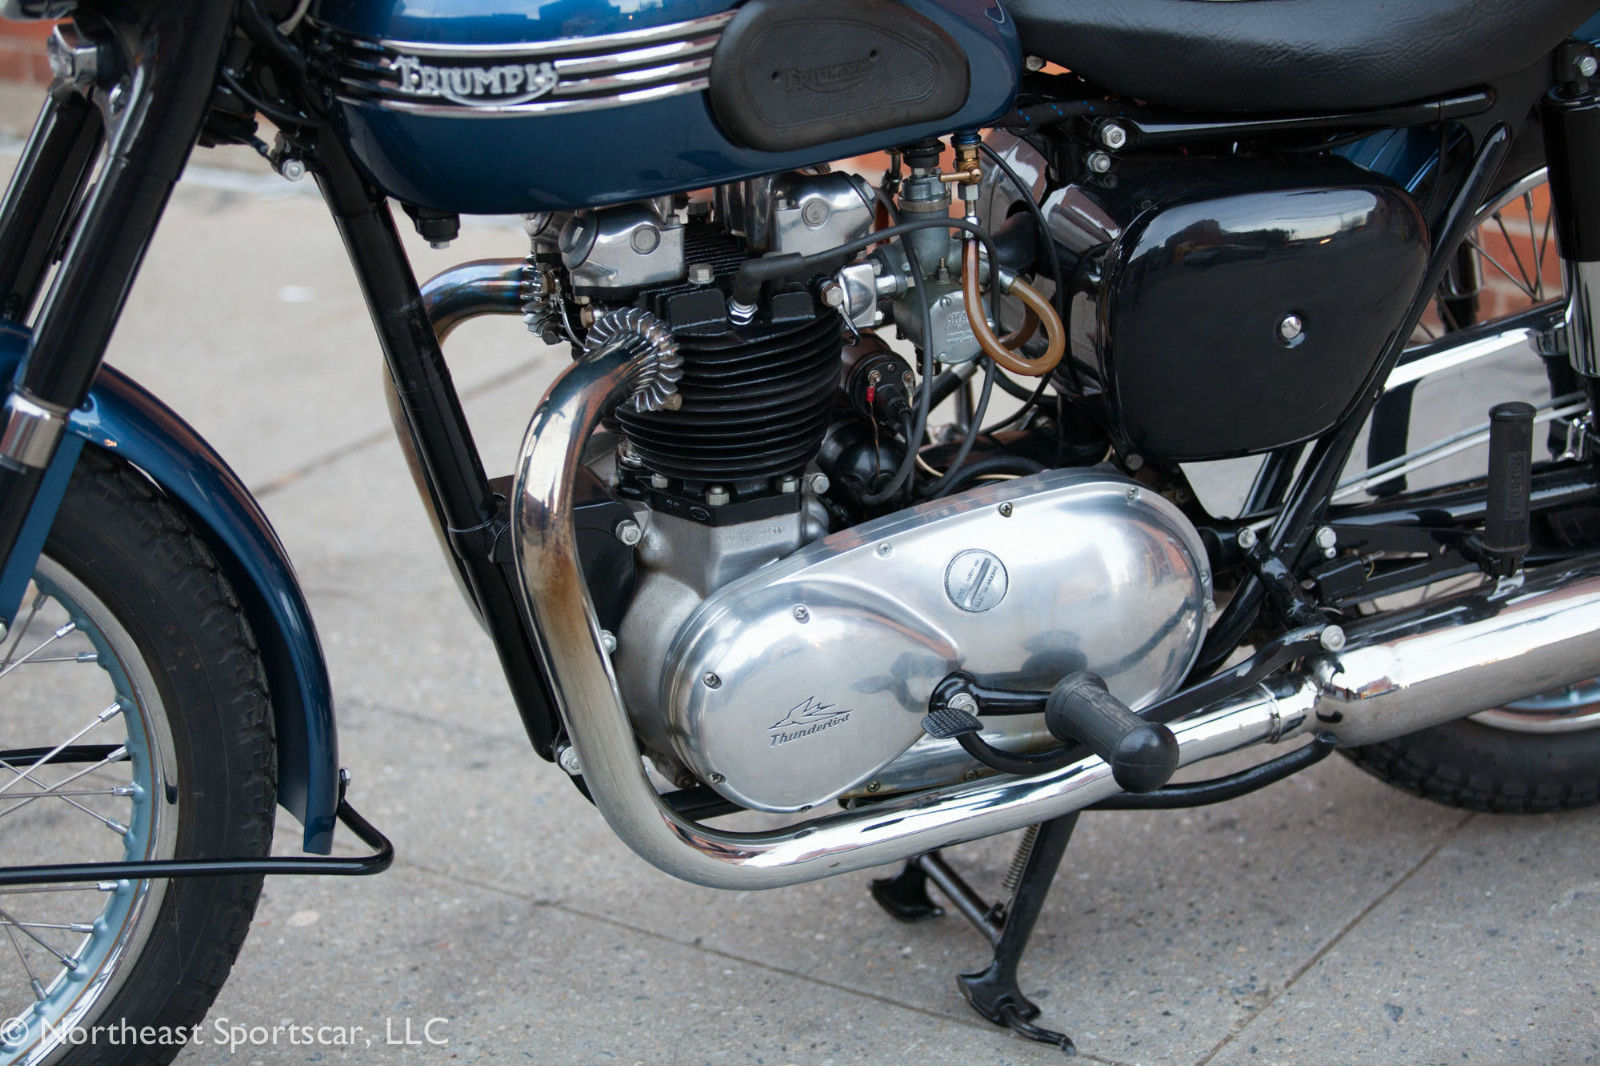 Triumph Thunderbird - 1955